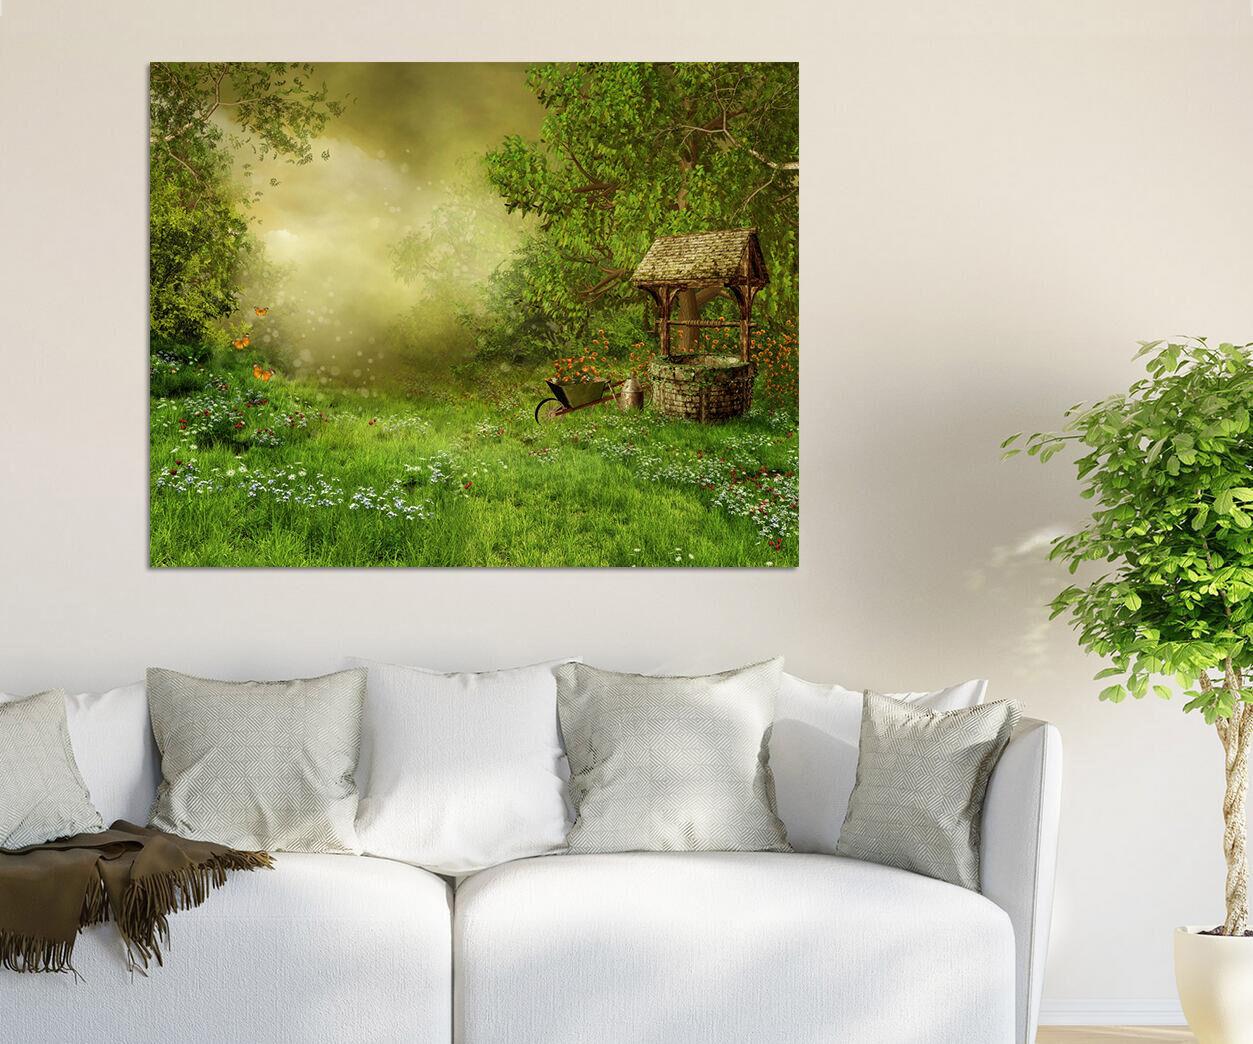 3D Schöne Gras, Blumen 23 Wandbild Fototapete BildTapete Familie AJSTORE DE